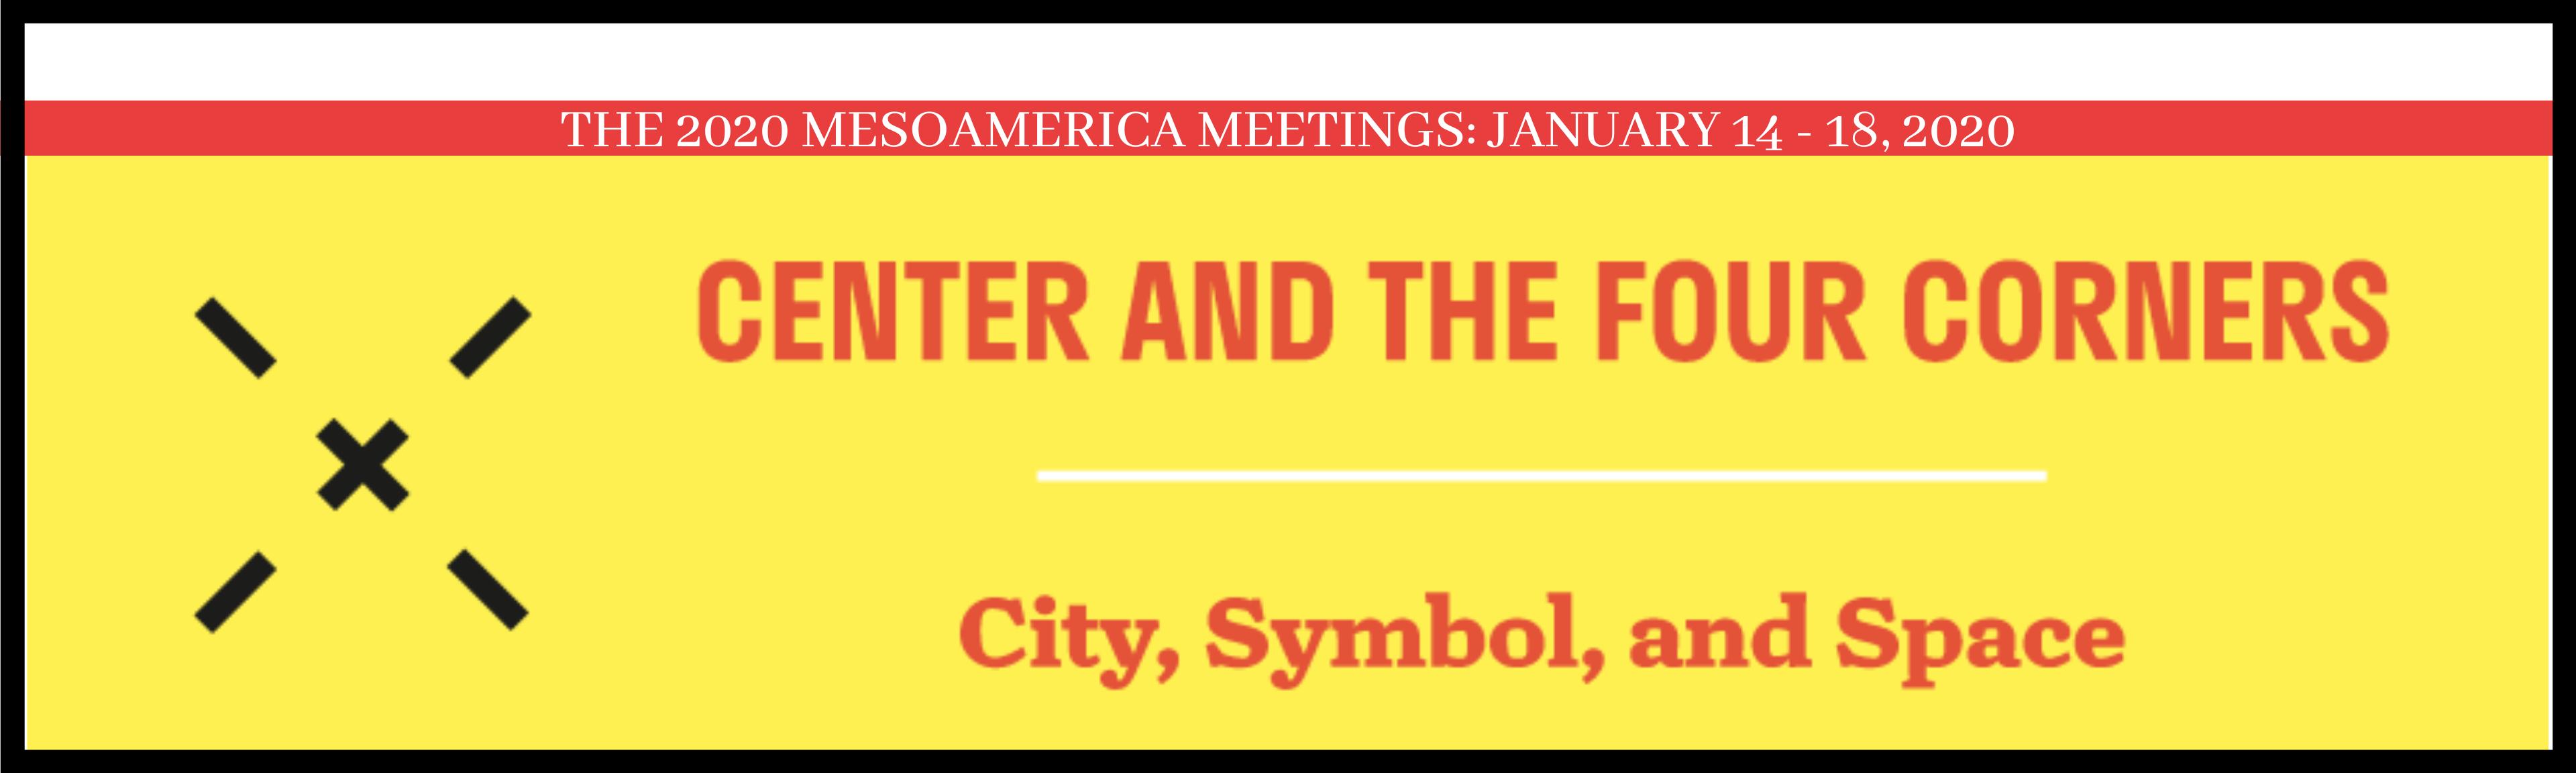 Symposium information